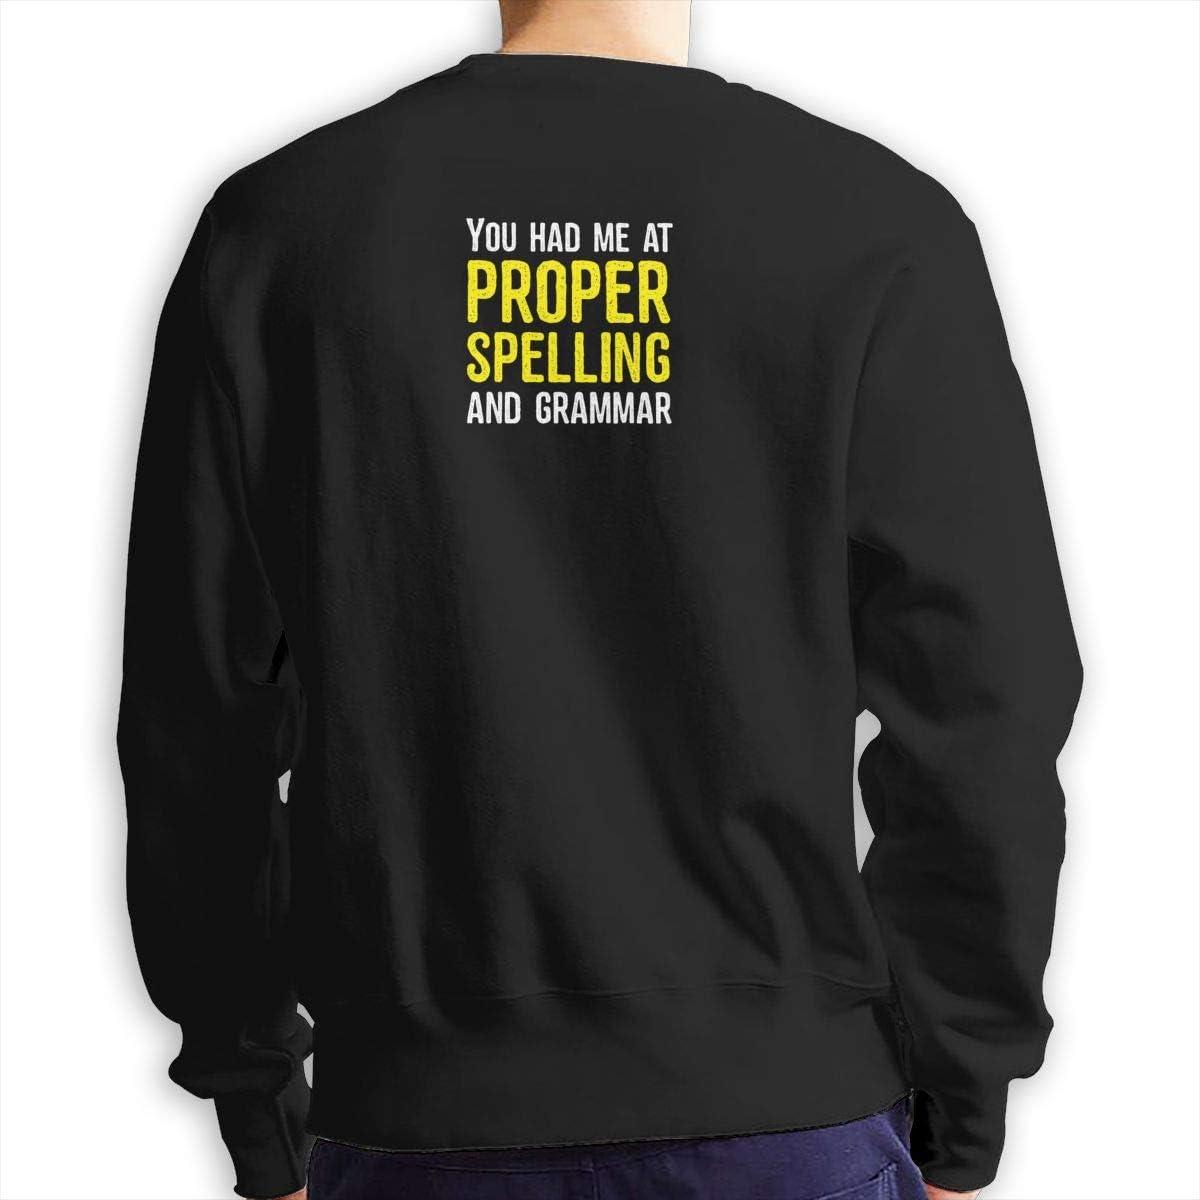 WxjvbmxbPow You Had Me at Proper Spelling /& Grammar Mens Cotton Casual Double Sides Print Long Sleeve Crewneck Sweatshirt